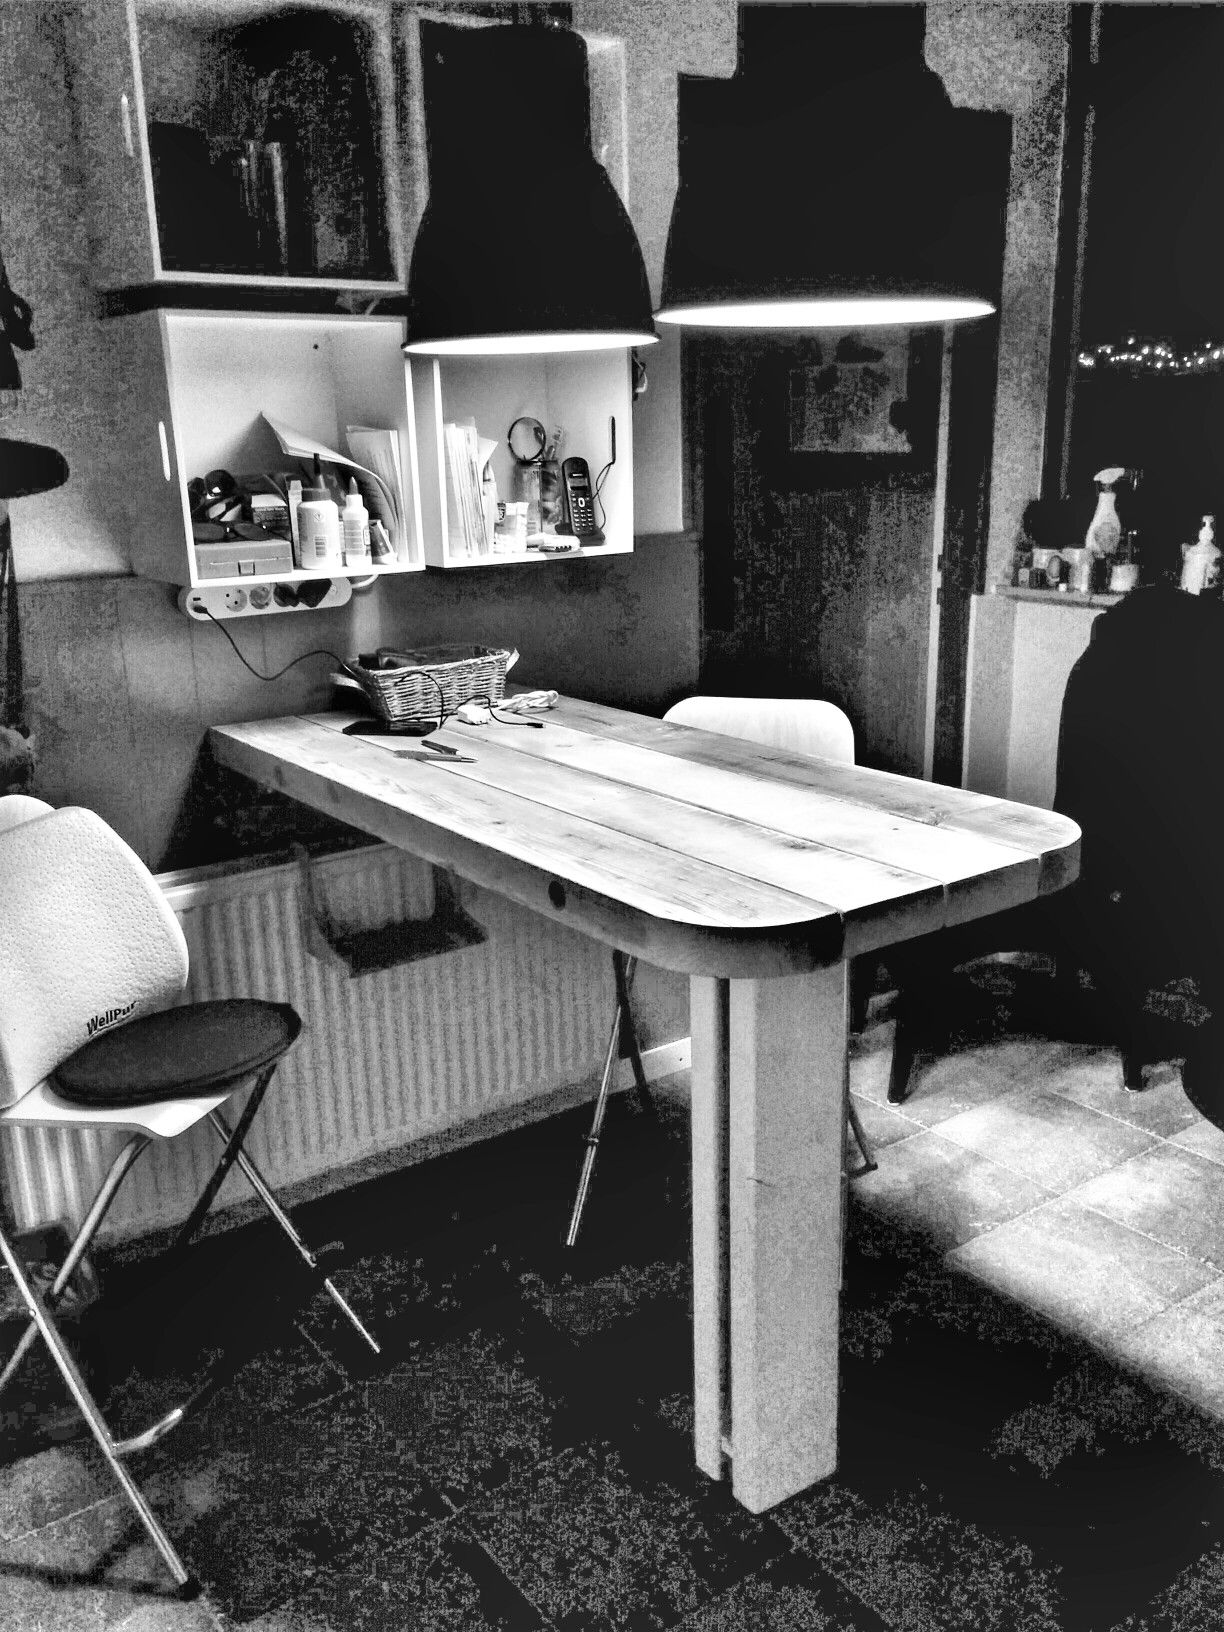 #keukentafel gemaakt van baddinghout #diy